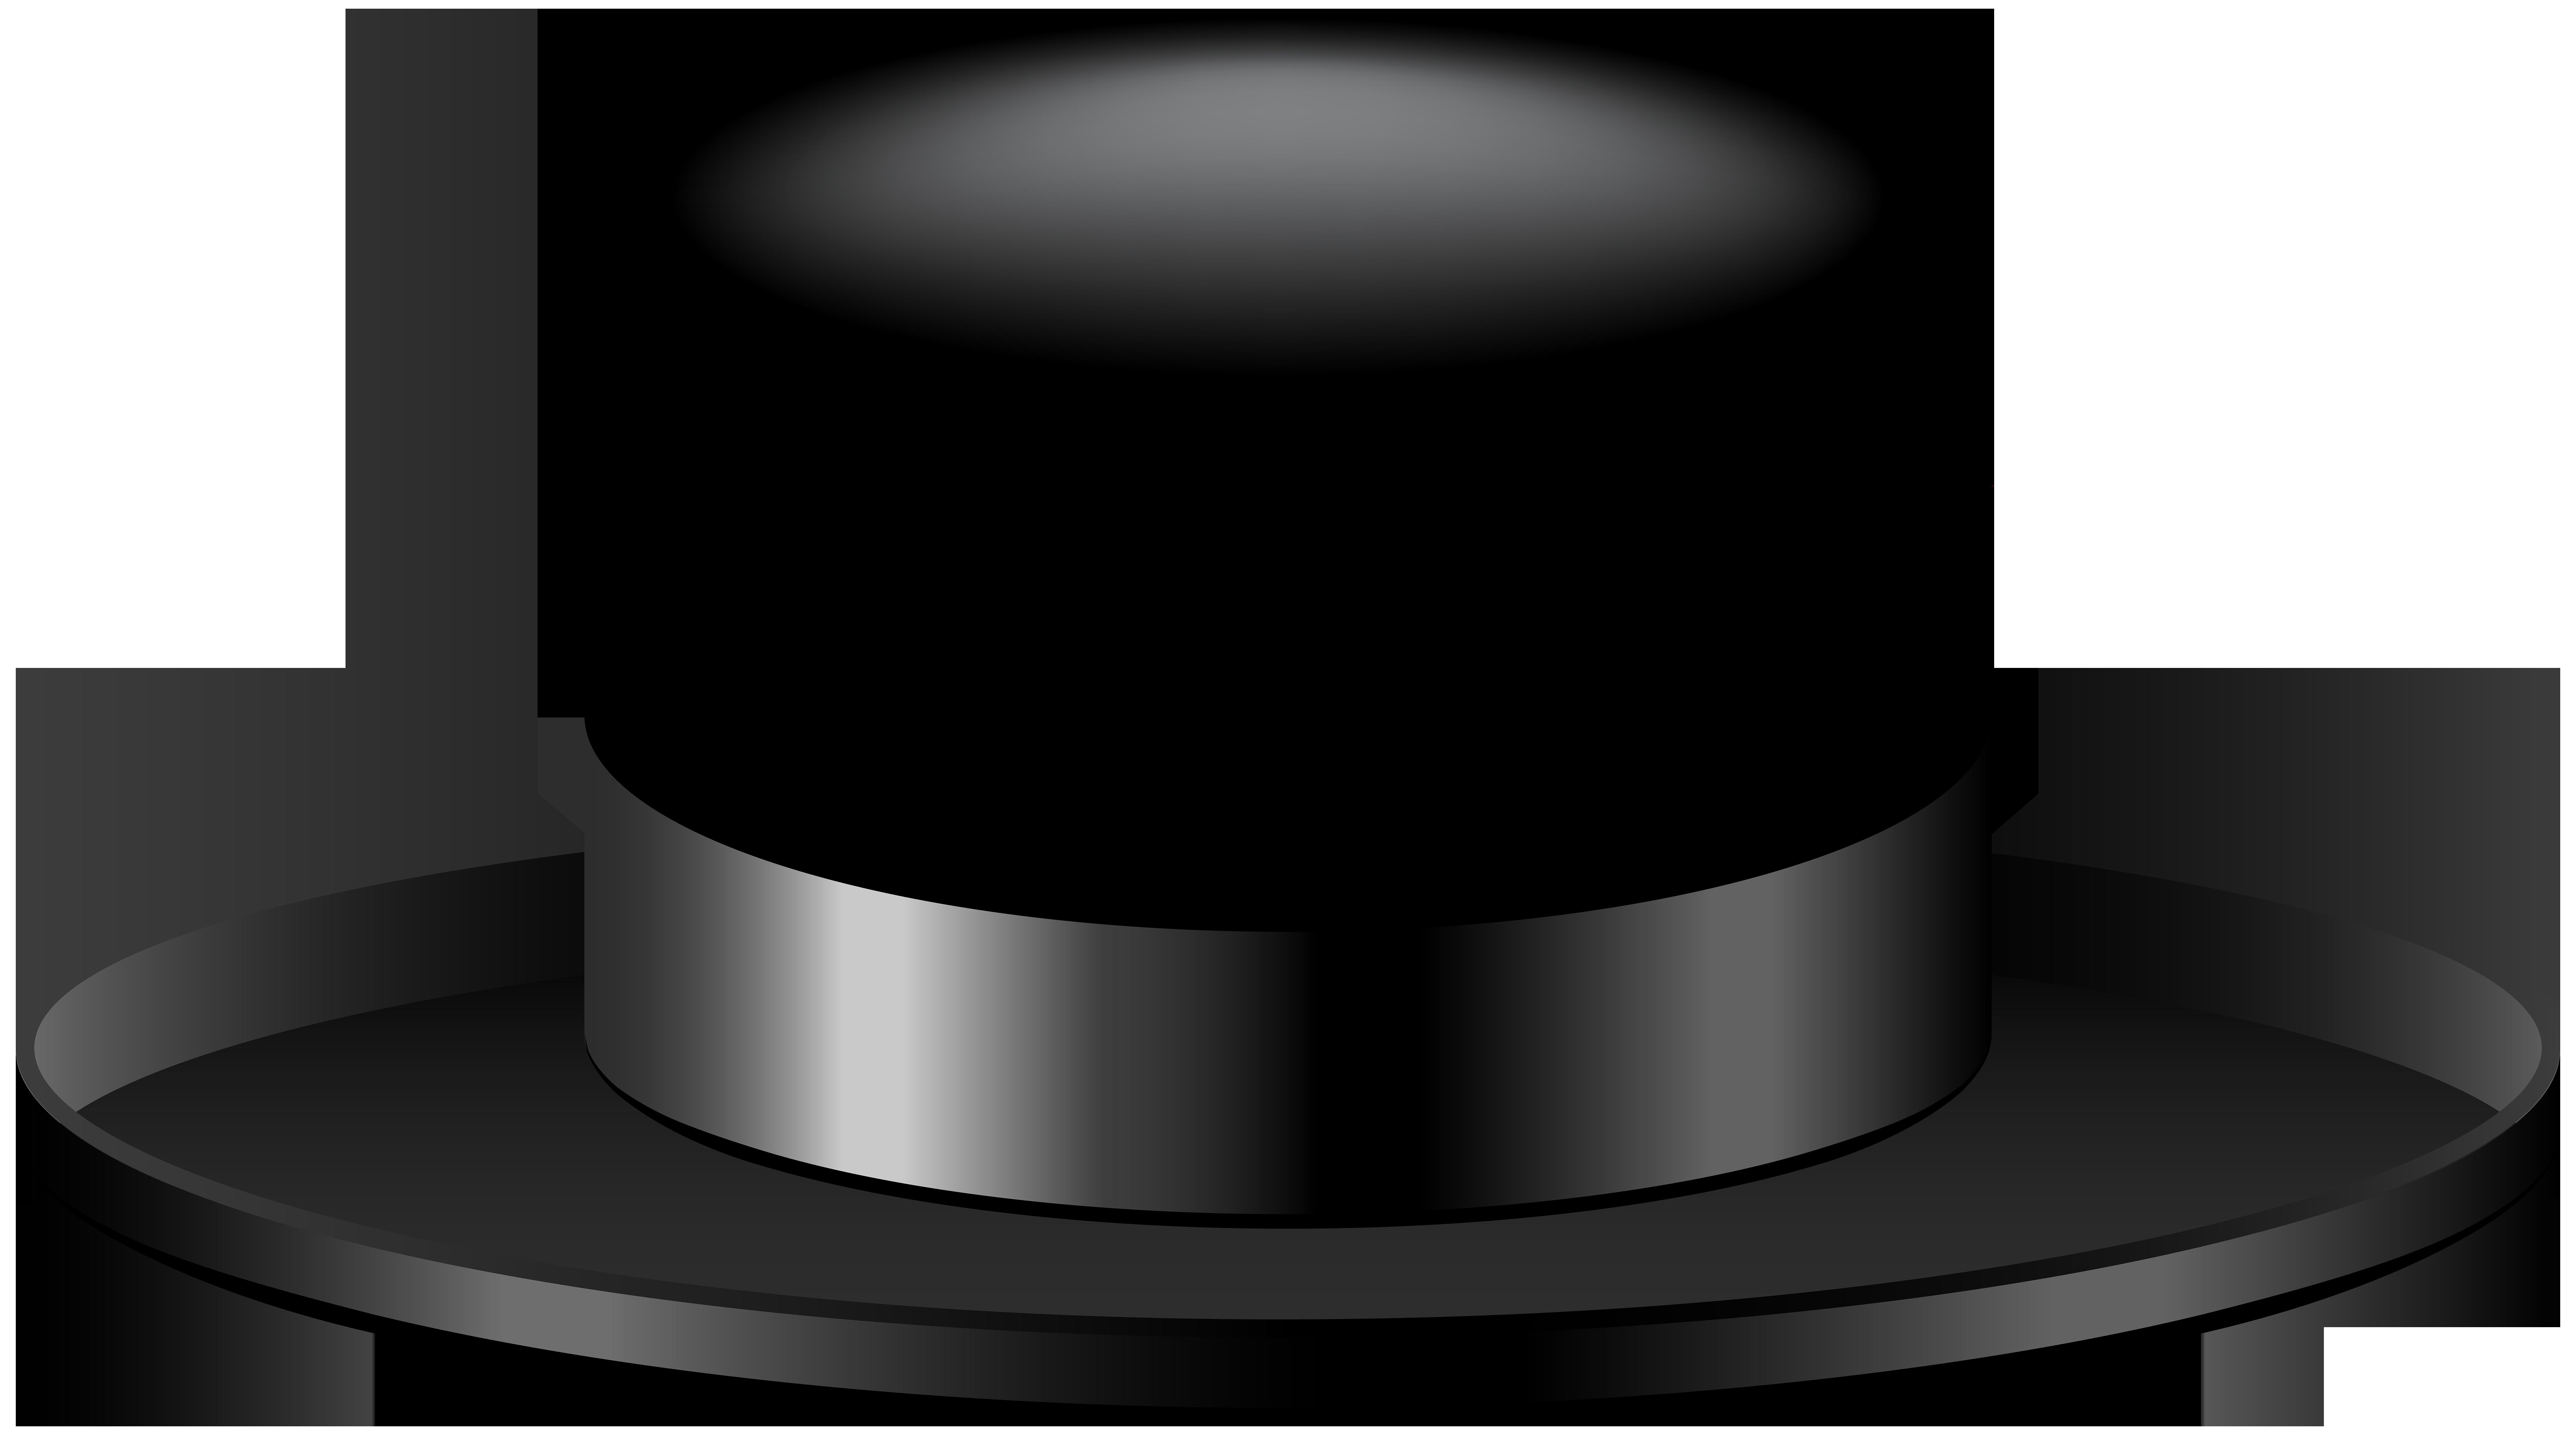 Black Hat Transparent Clip Art Image.